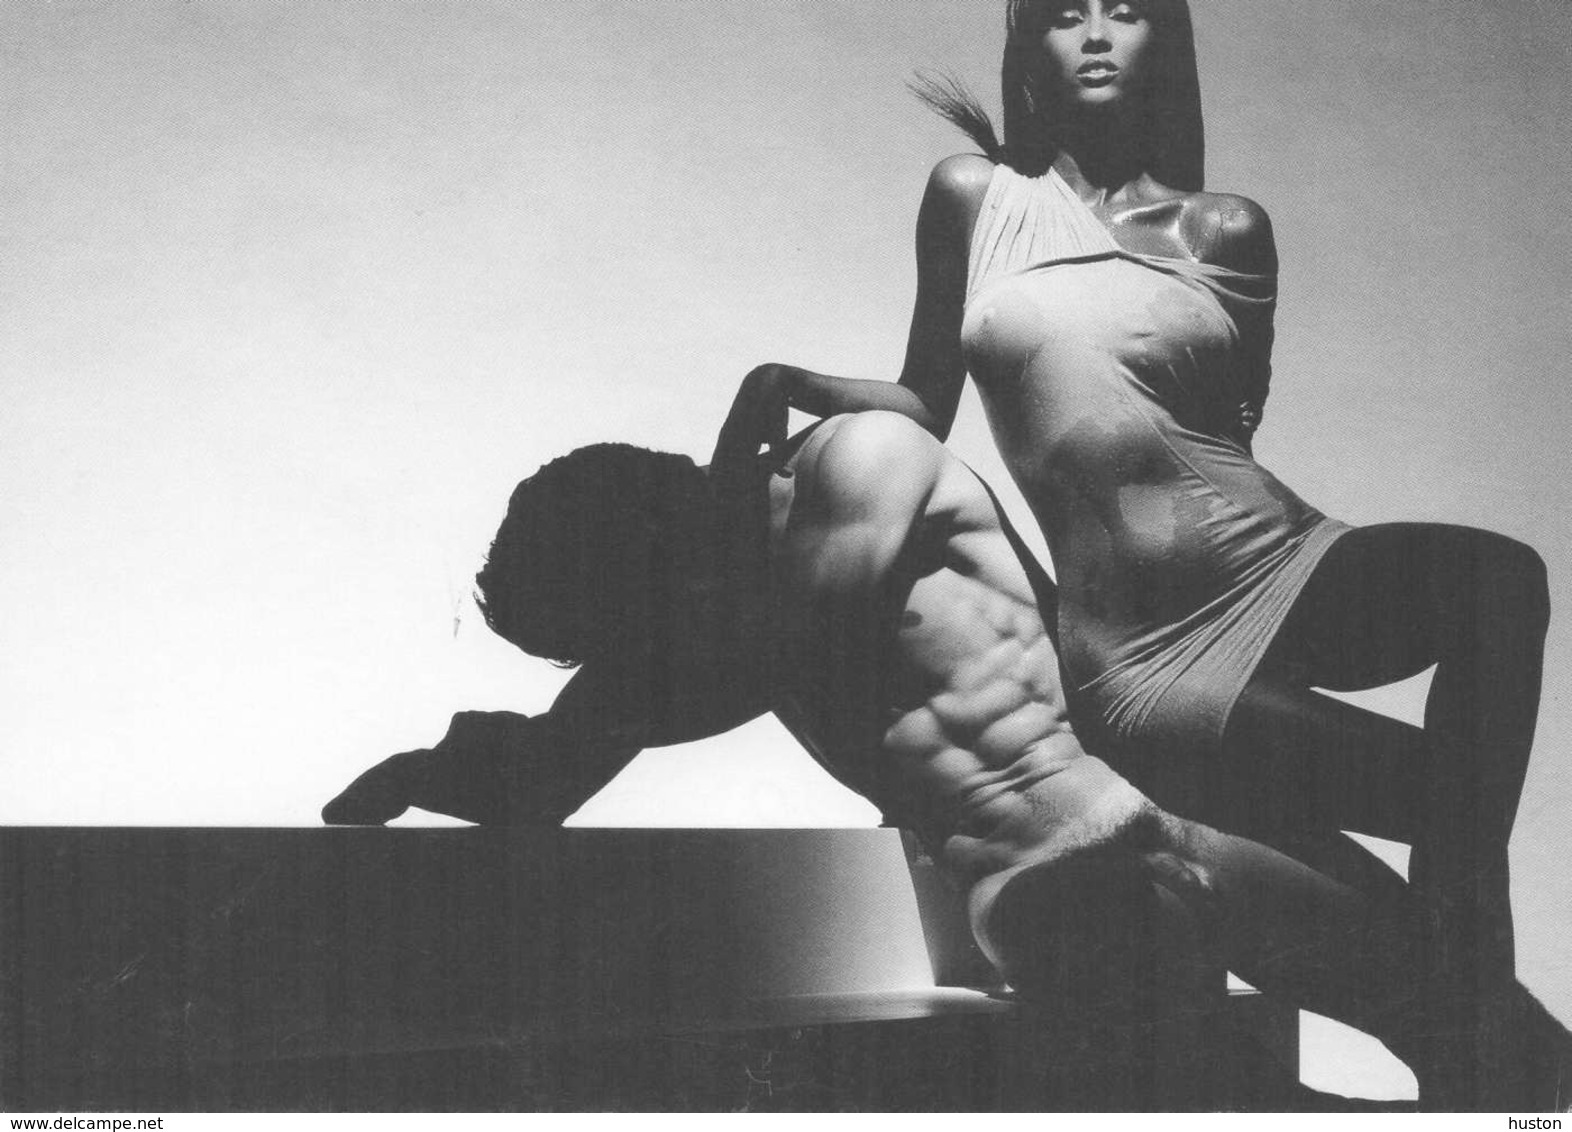 1991 - Iman With Nude - Femme, Homme Nu - Vintage Divas < 1960